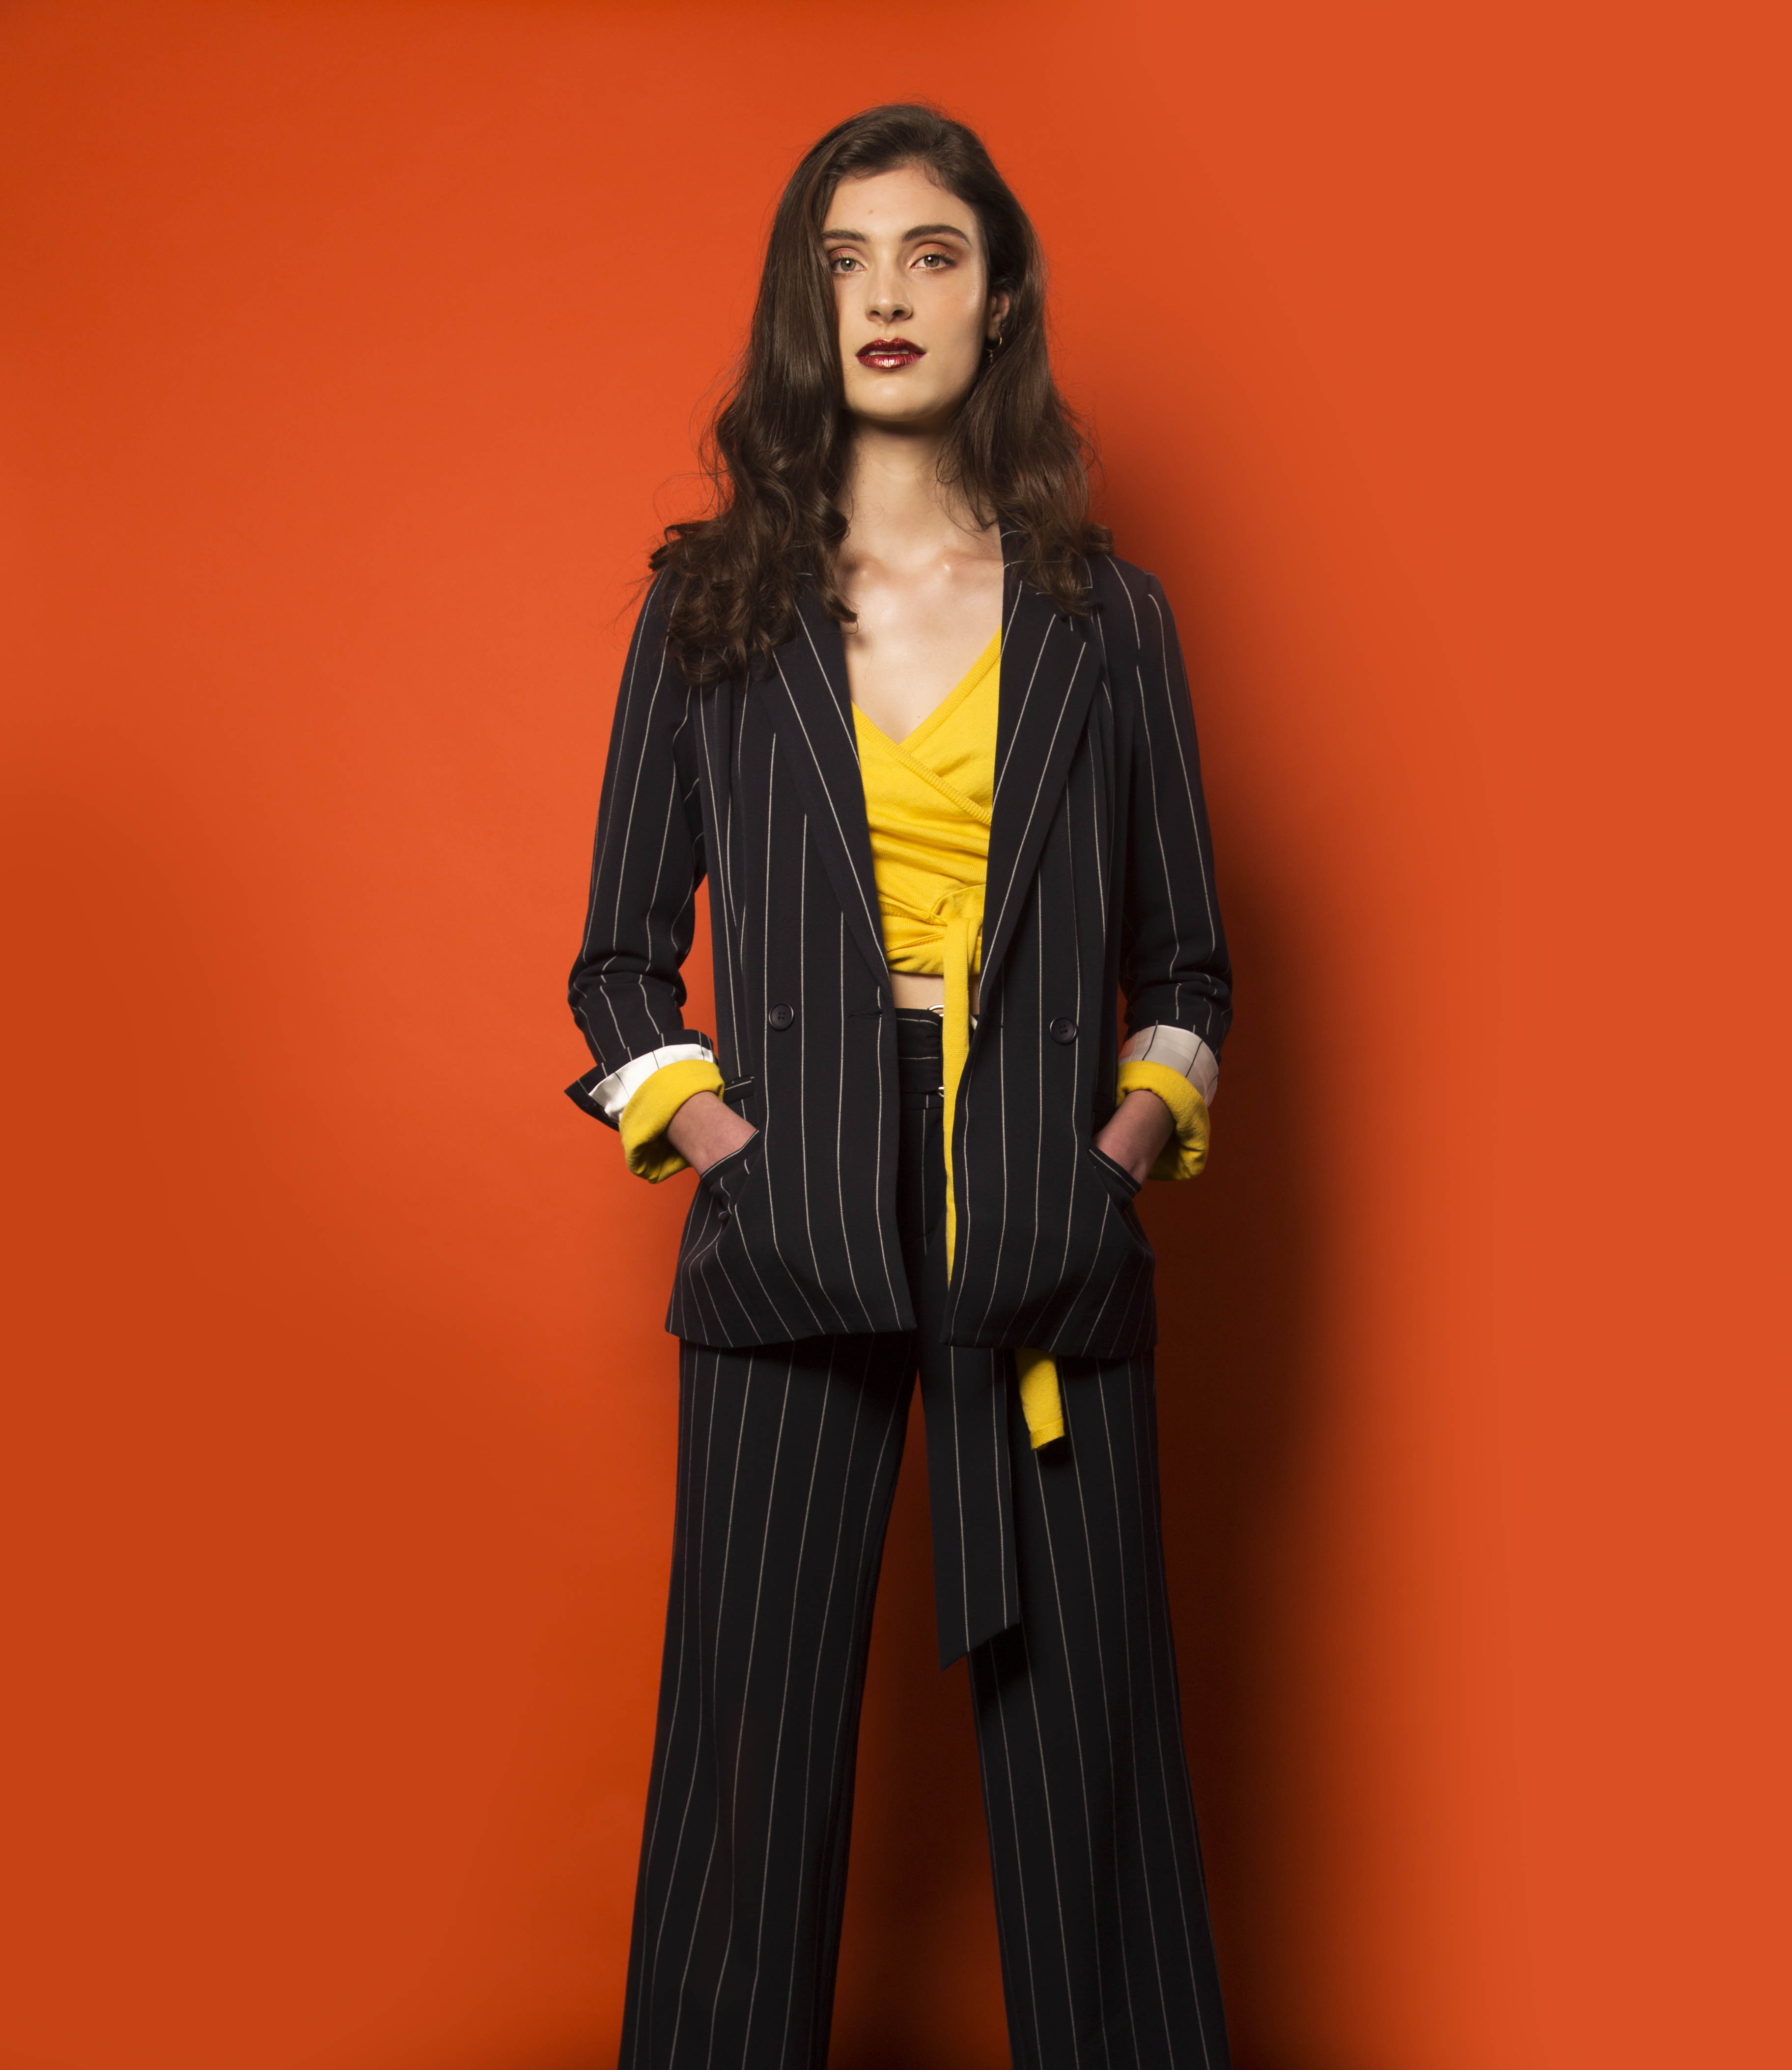 Photographer & Stylist: Caitlan Mitchell Model: Angelica Santini at 62 Models Hair, Makeup & Nails: Tanya Barlow from Hello Tanya